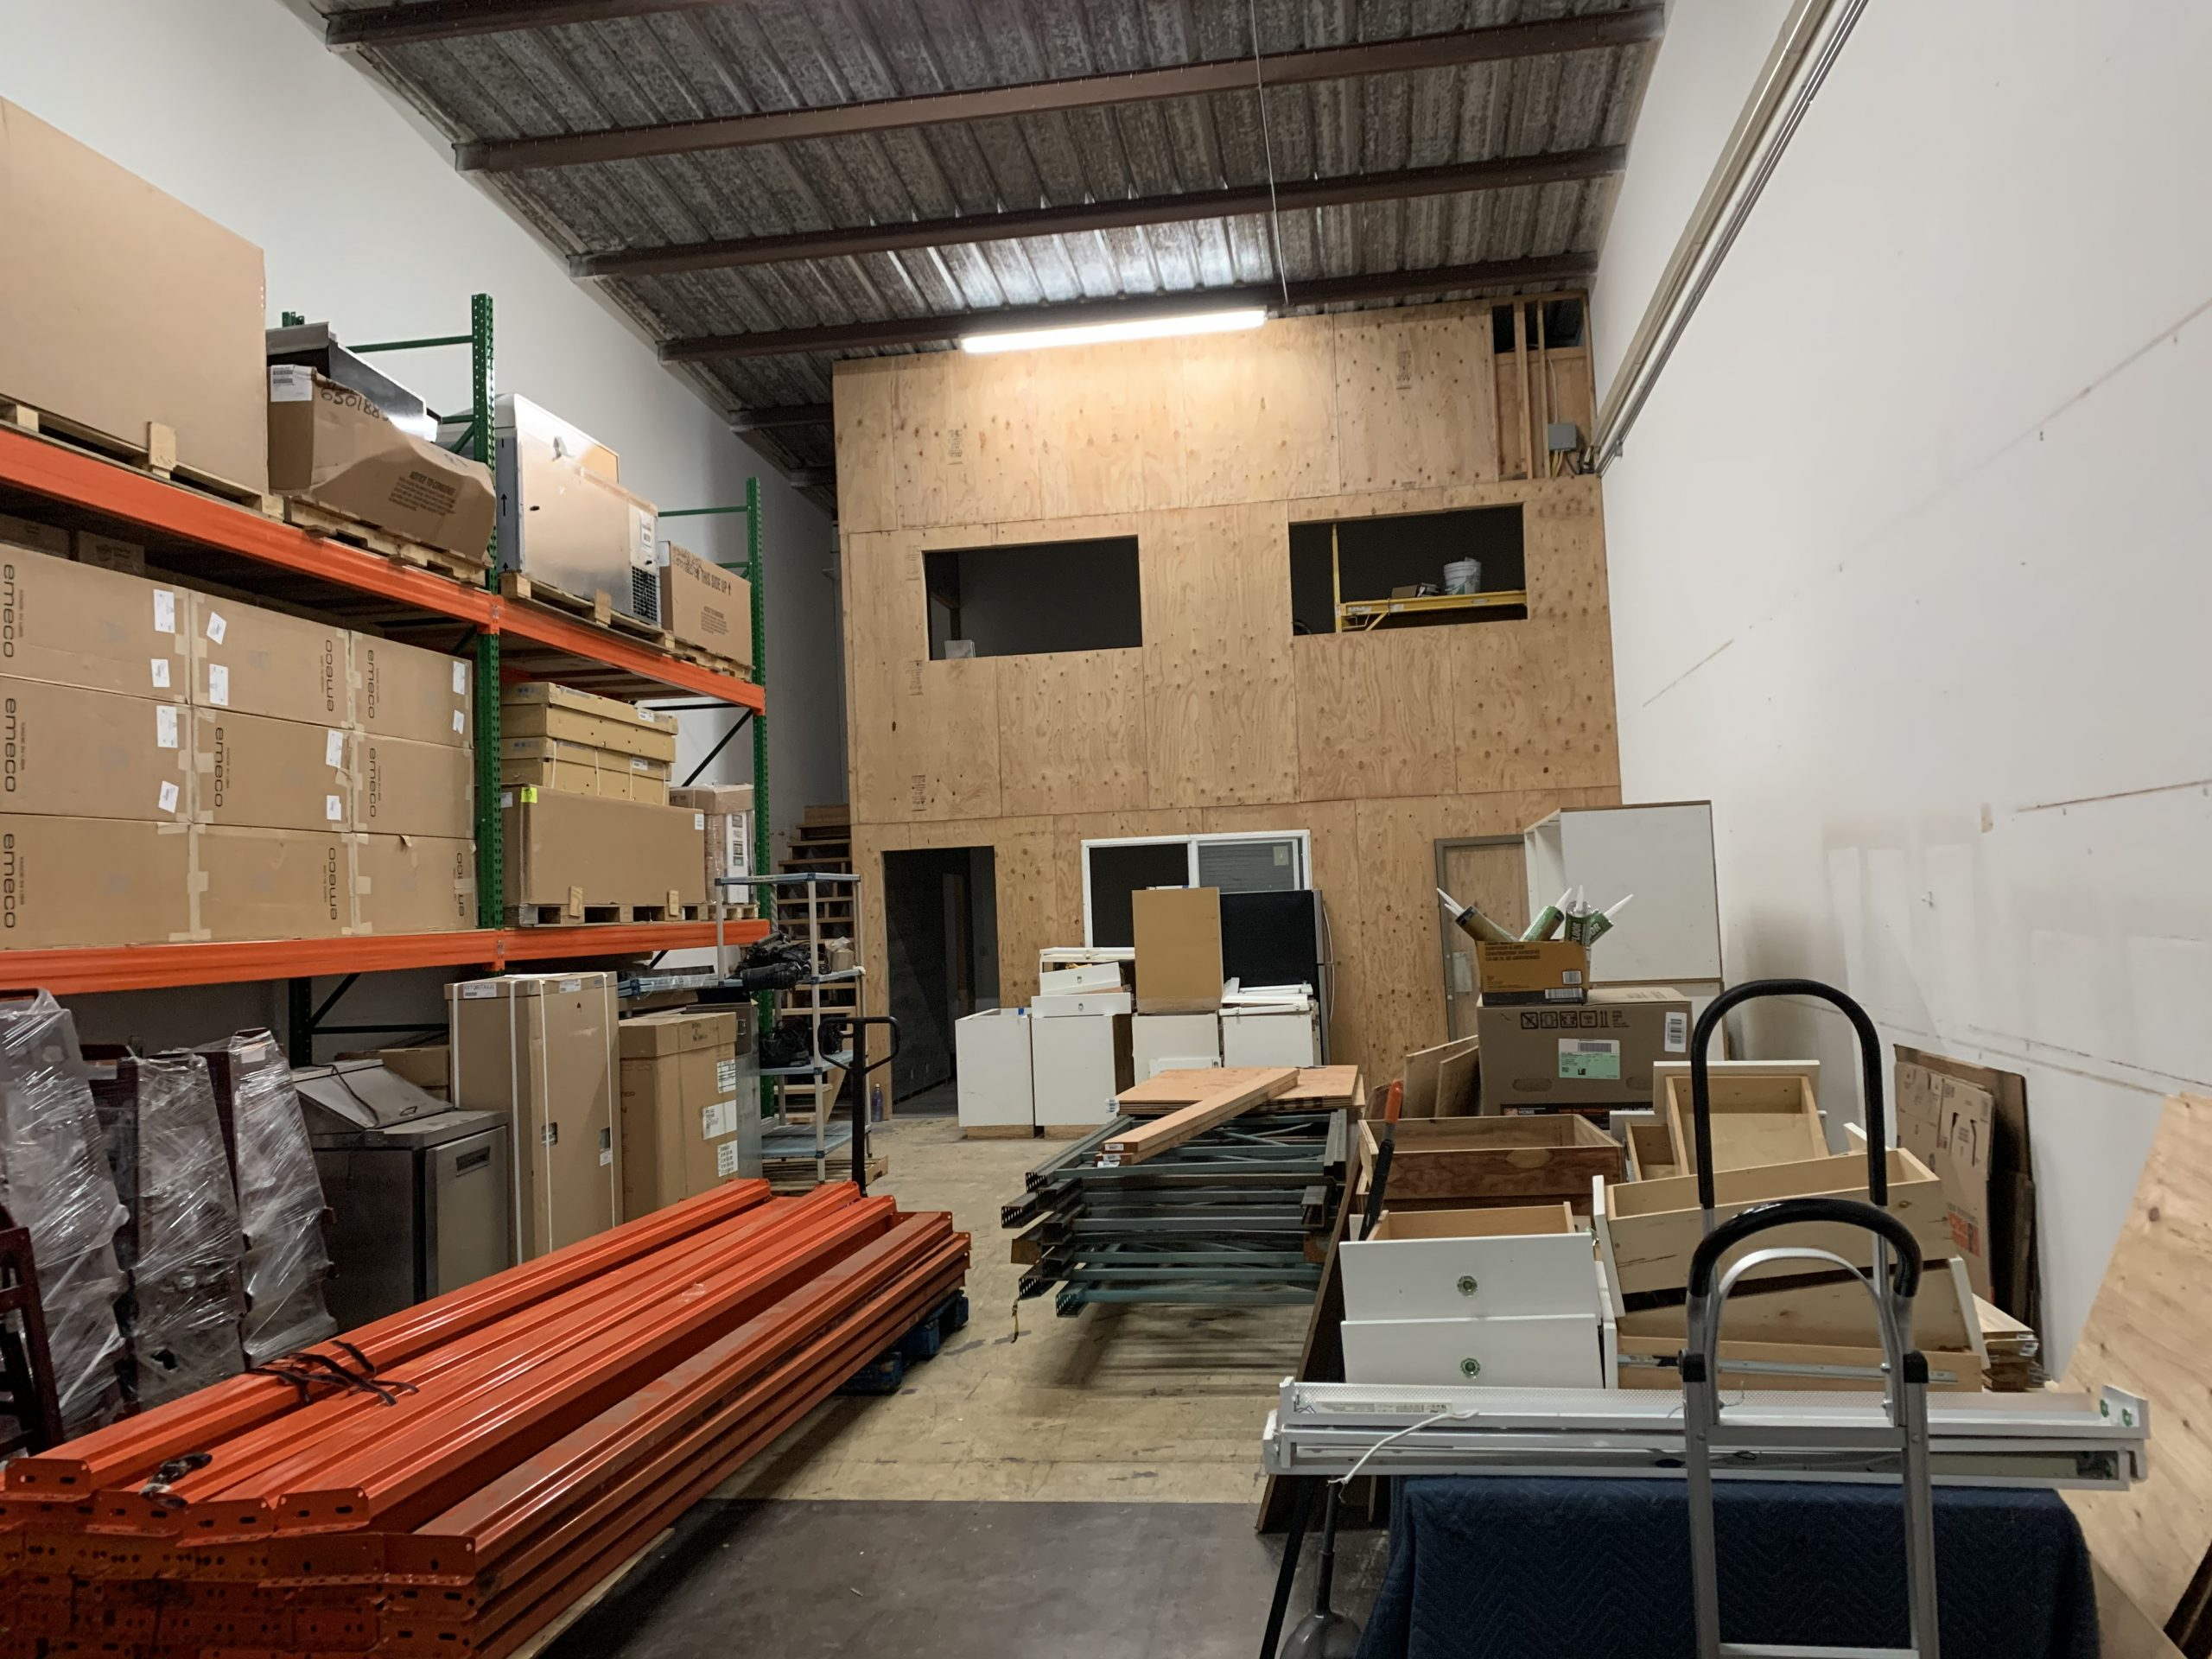 Fast Comet Warehouse 5 - Maui Hawaii - Movers